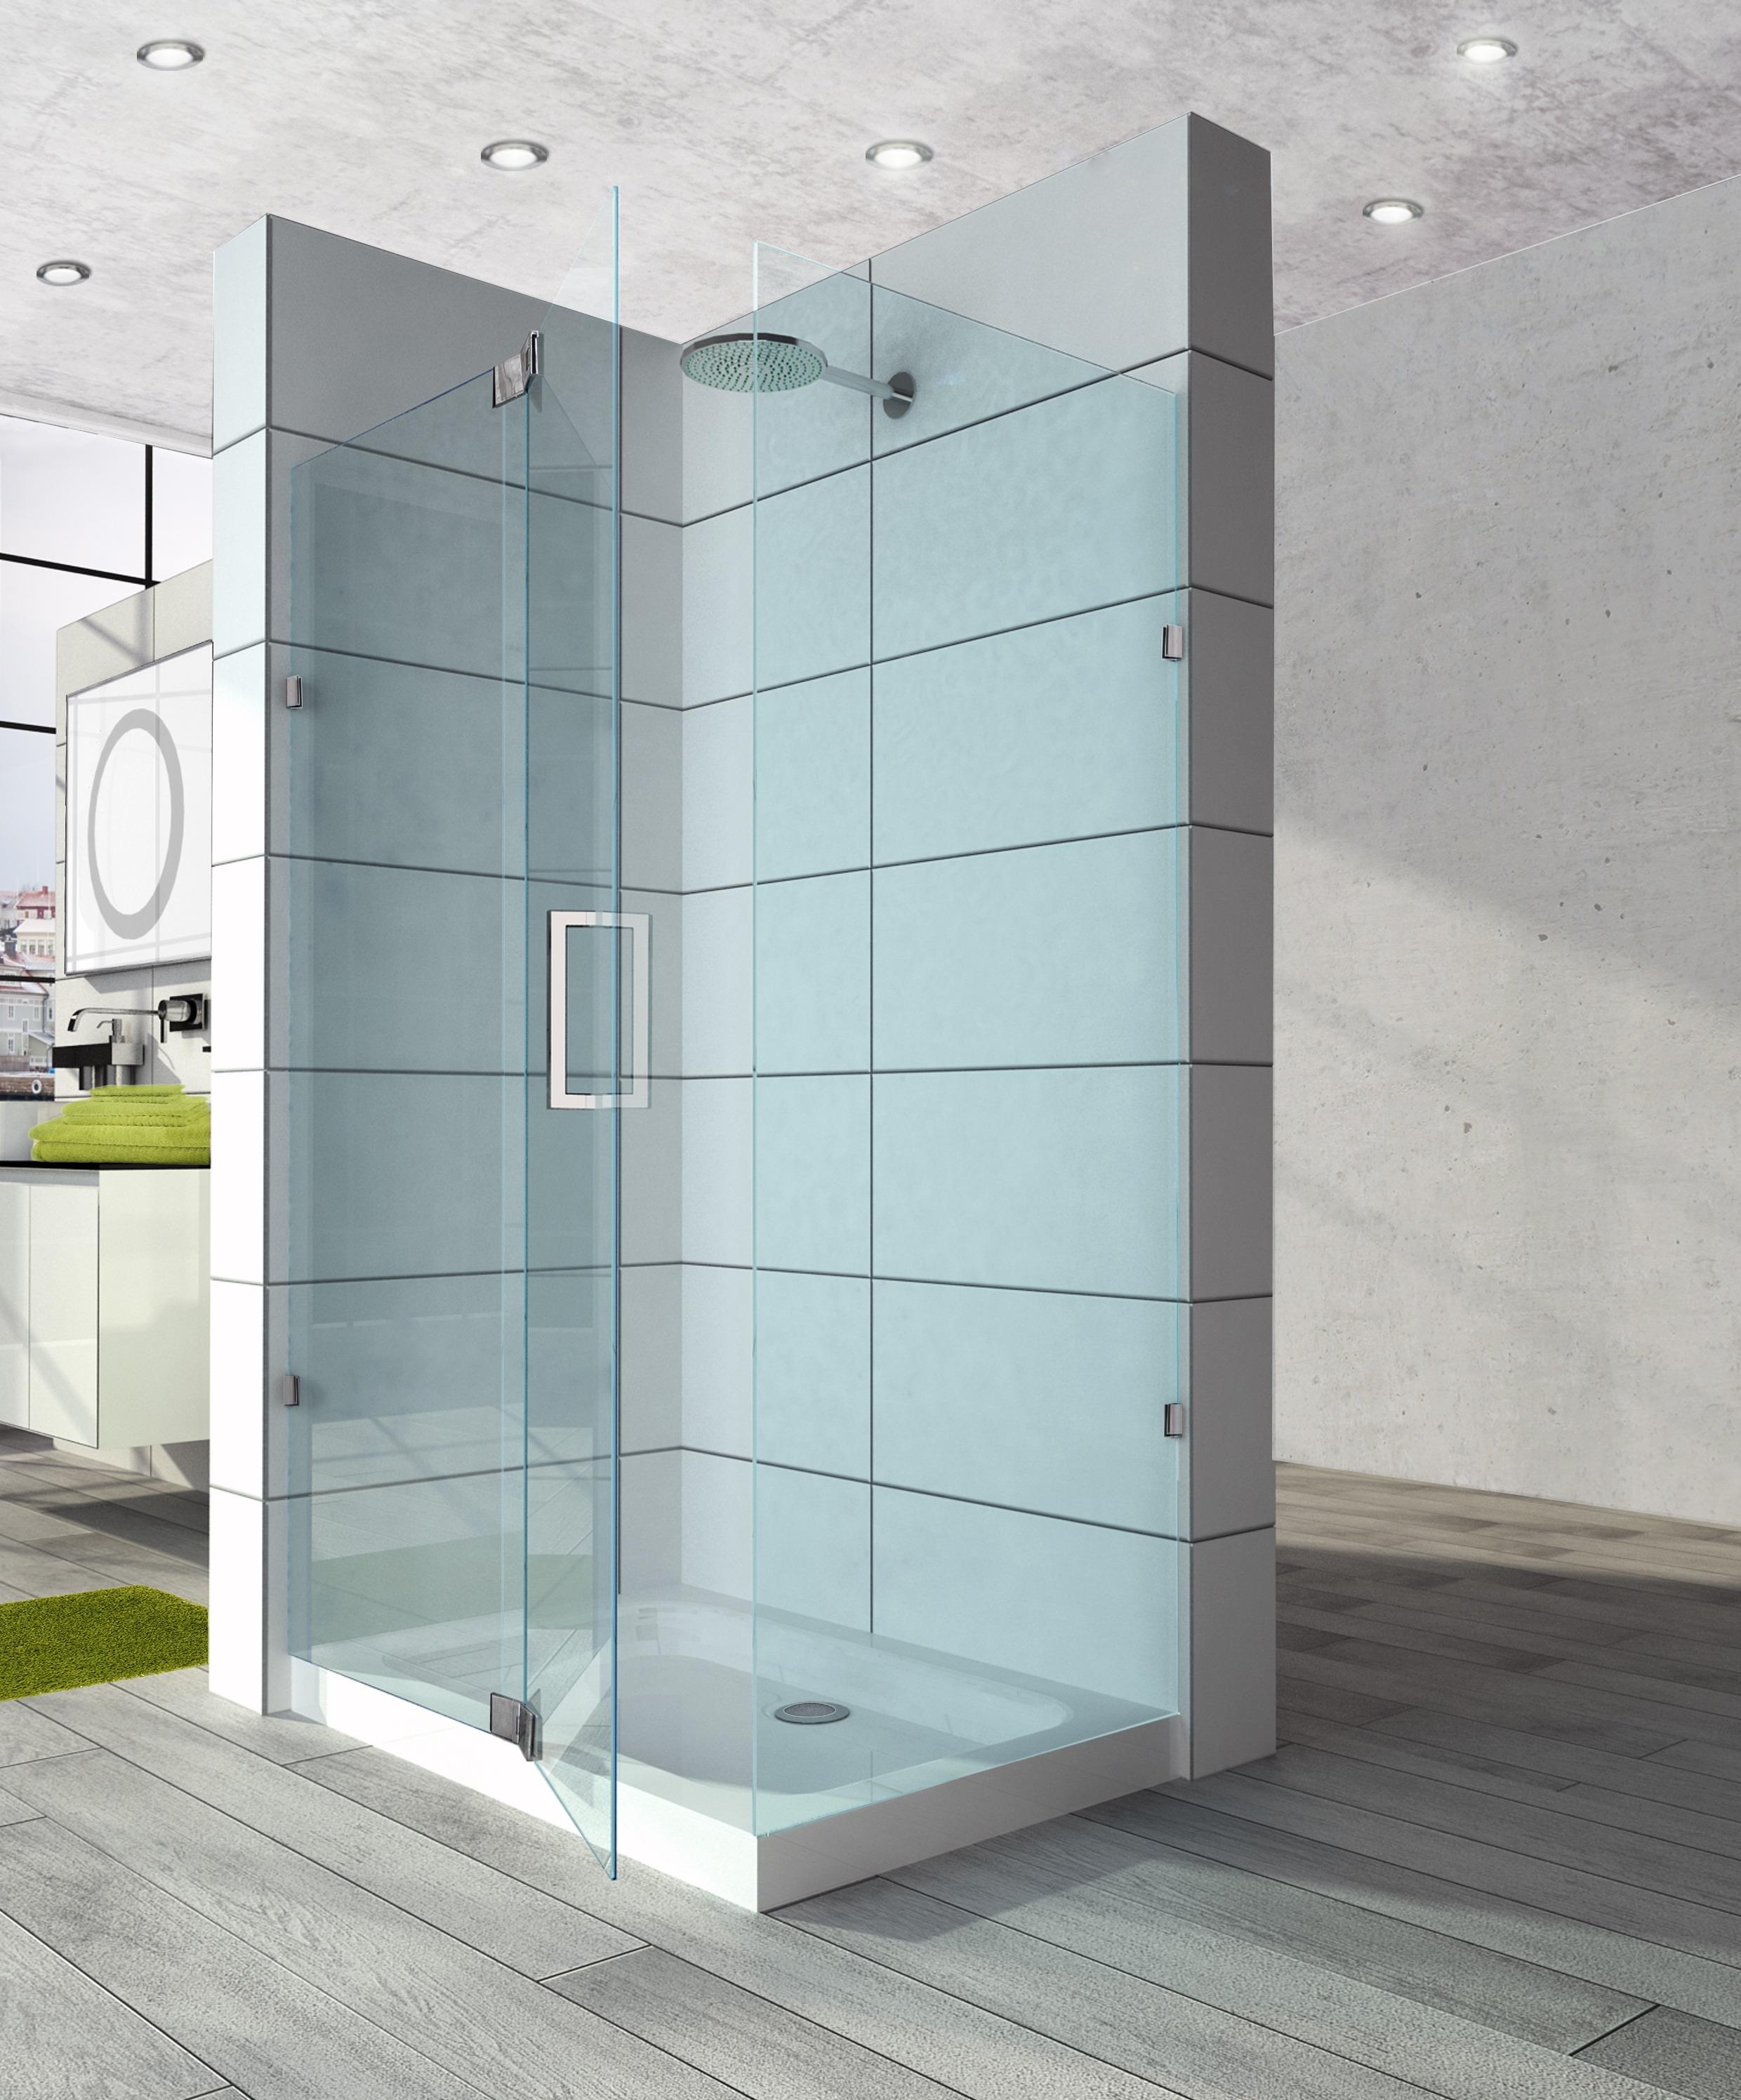 Beautiful Shower Glass Screens Composition Bathtub Ideas Greenriverpedigree Info